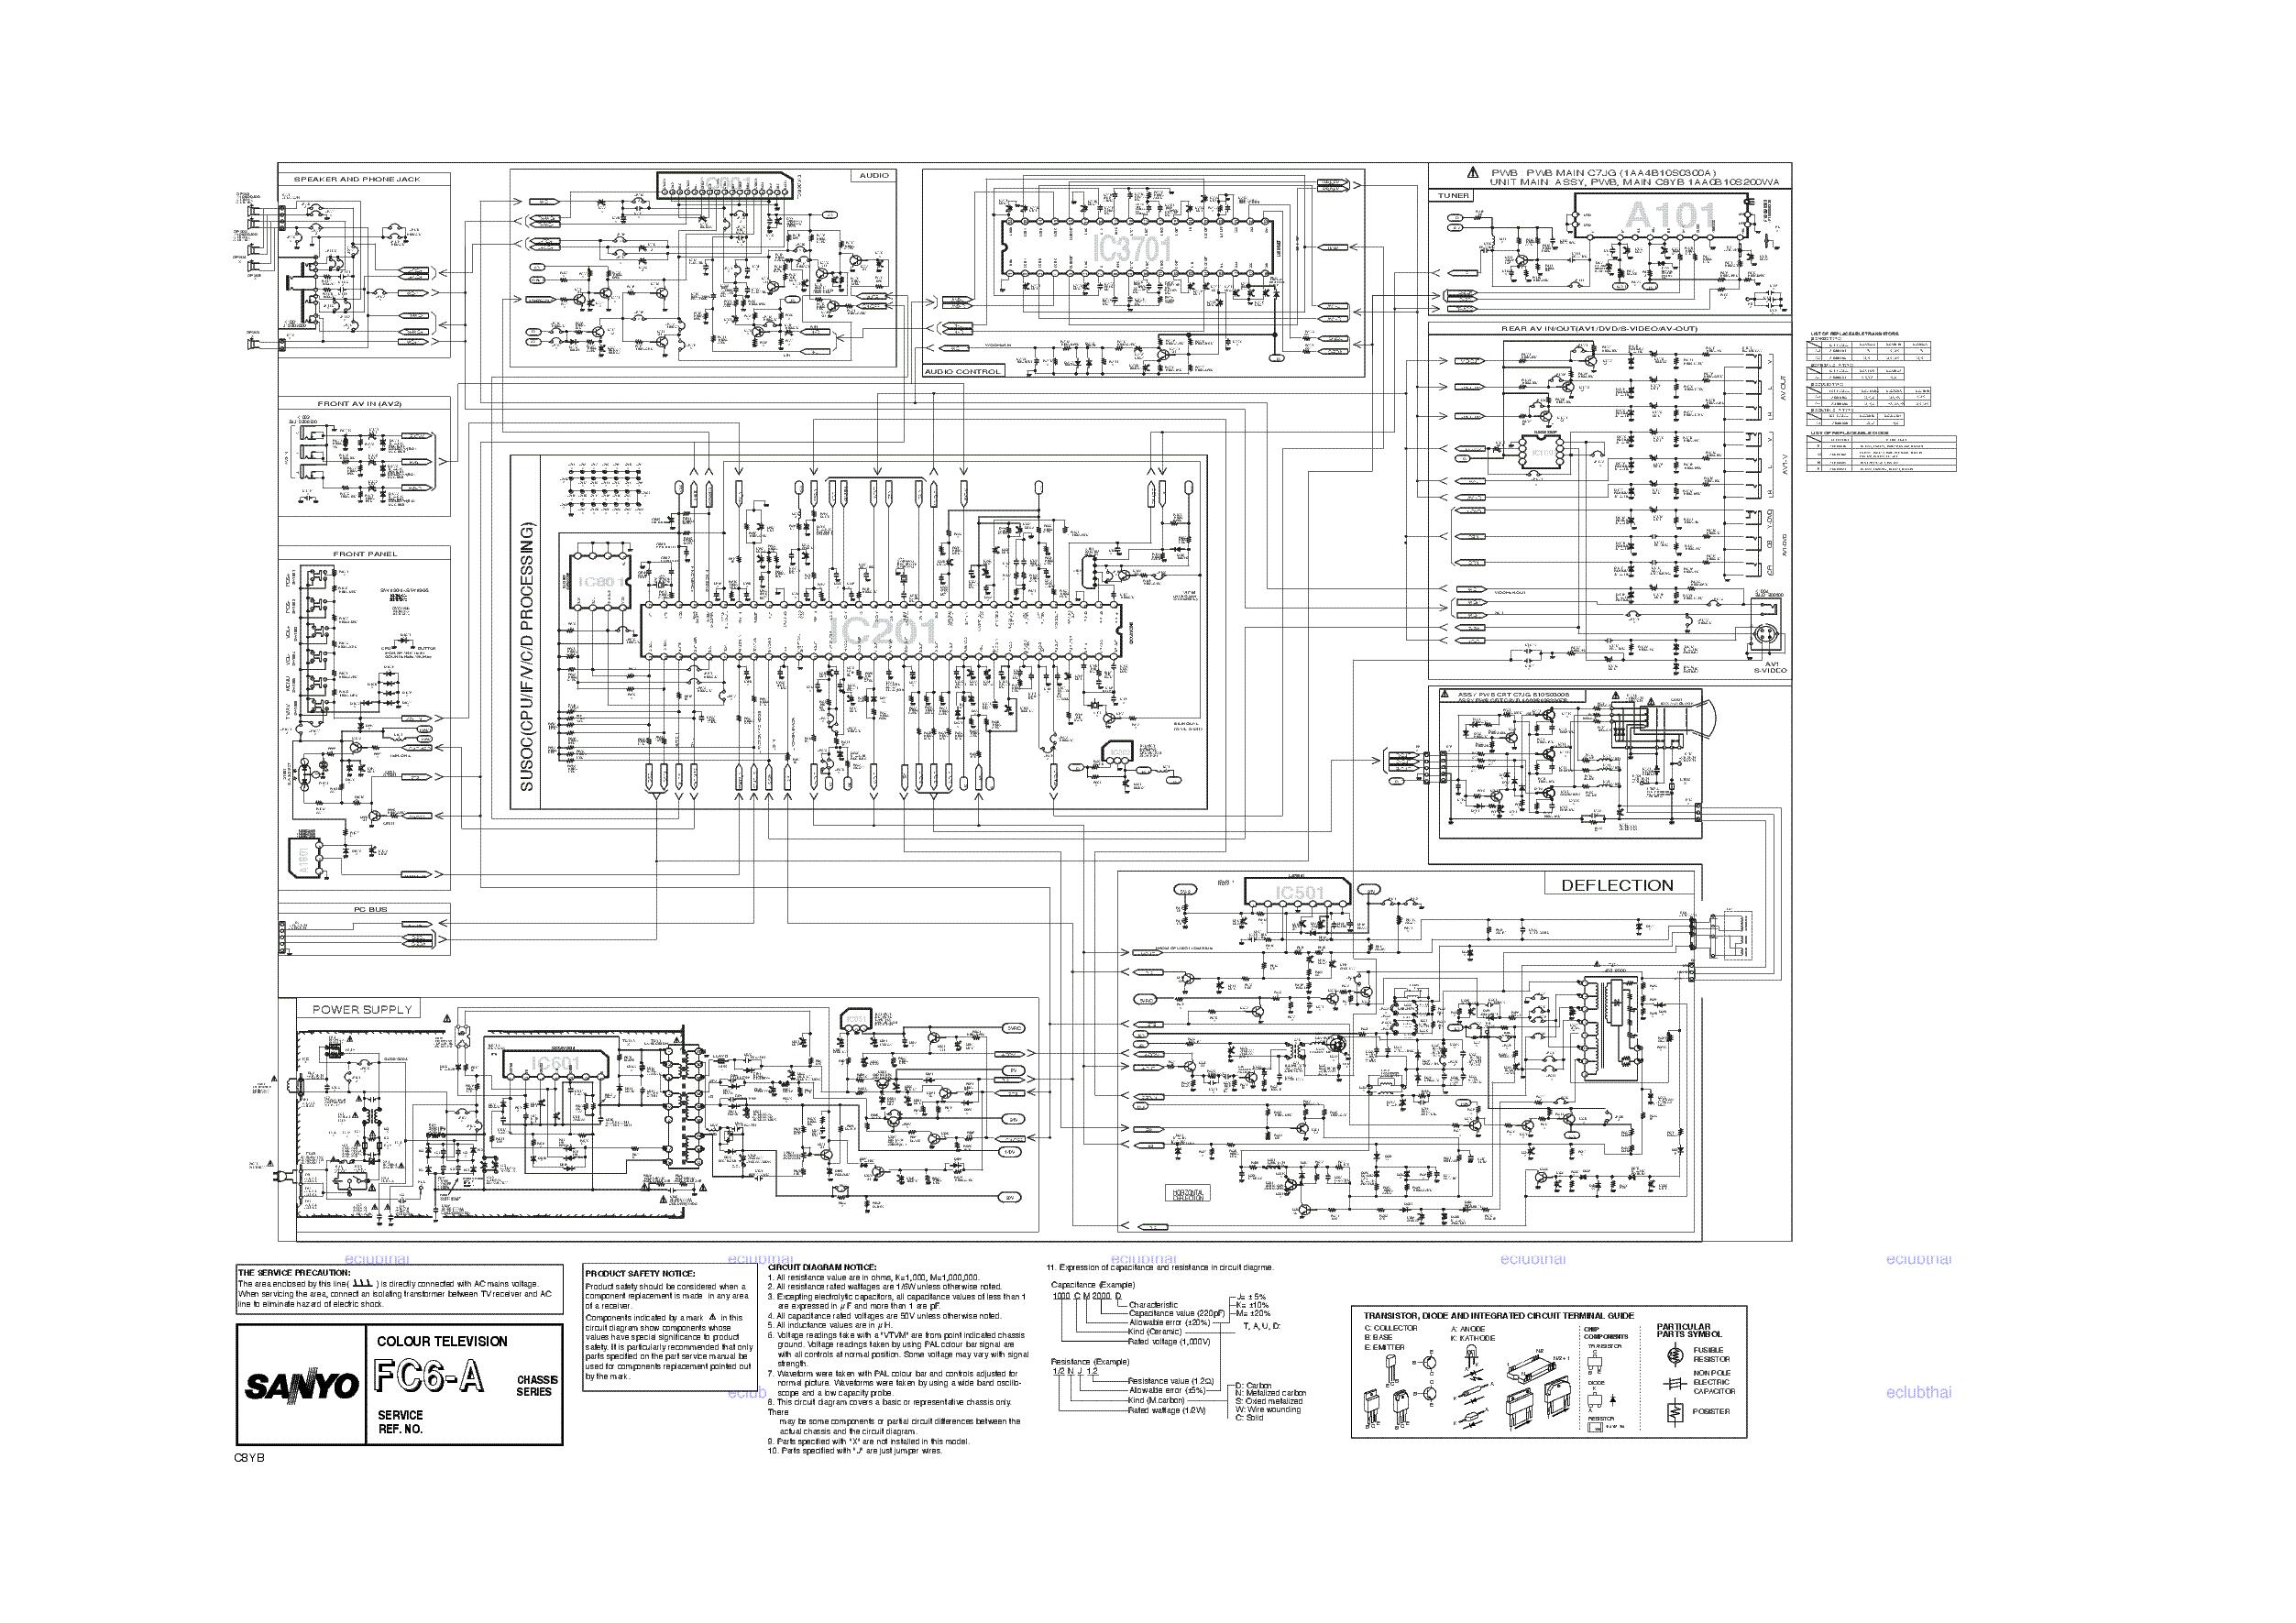 11684 sanyo tv wiring diagram digital resources lcd tv wiring diagram sanyo tv wiring diagram #8